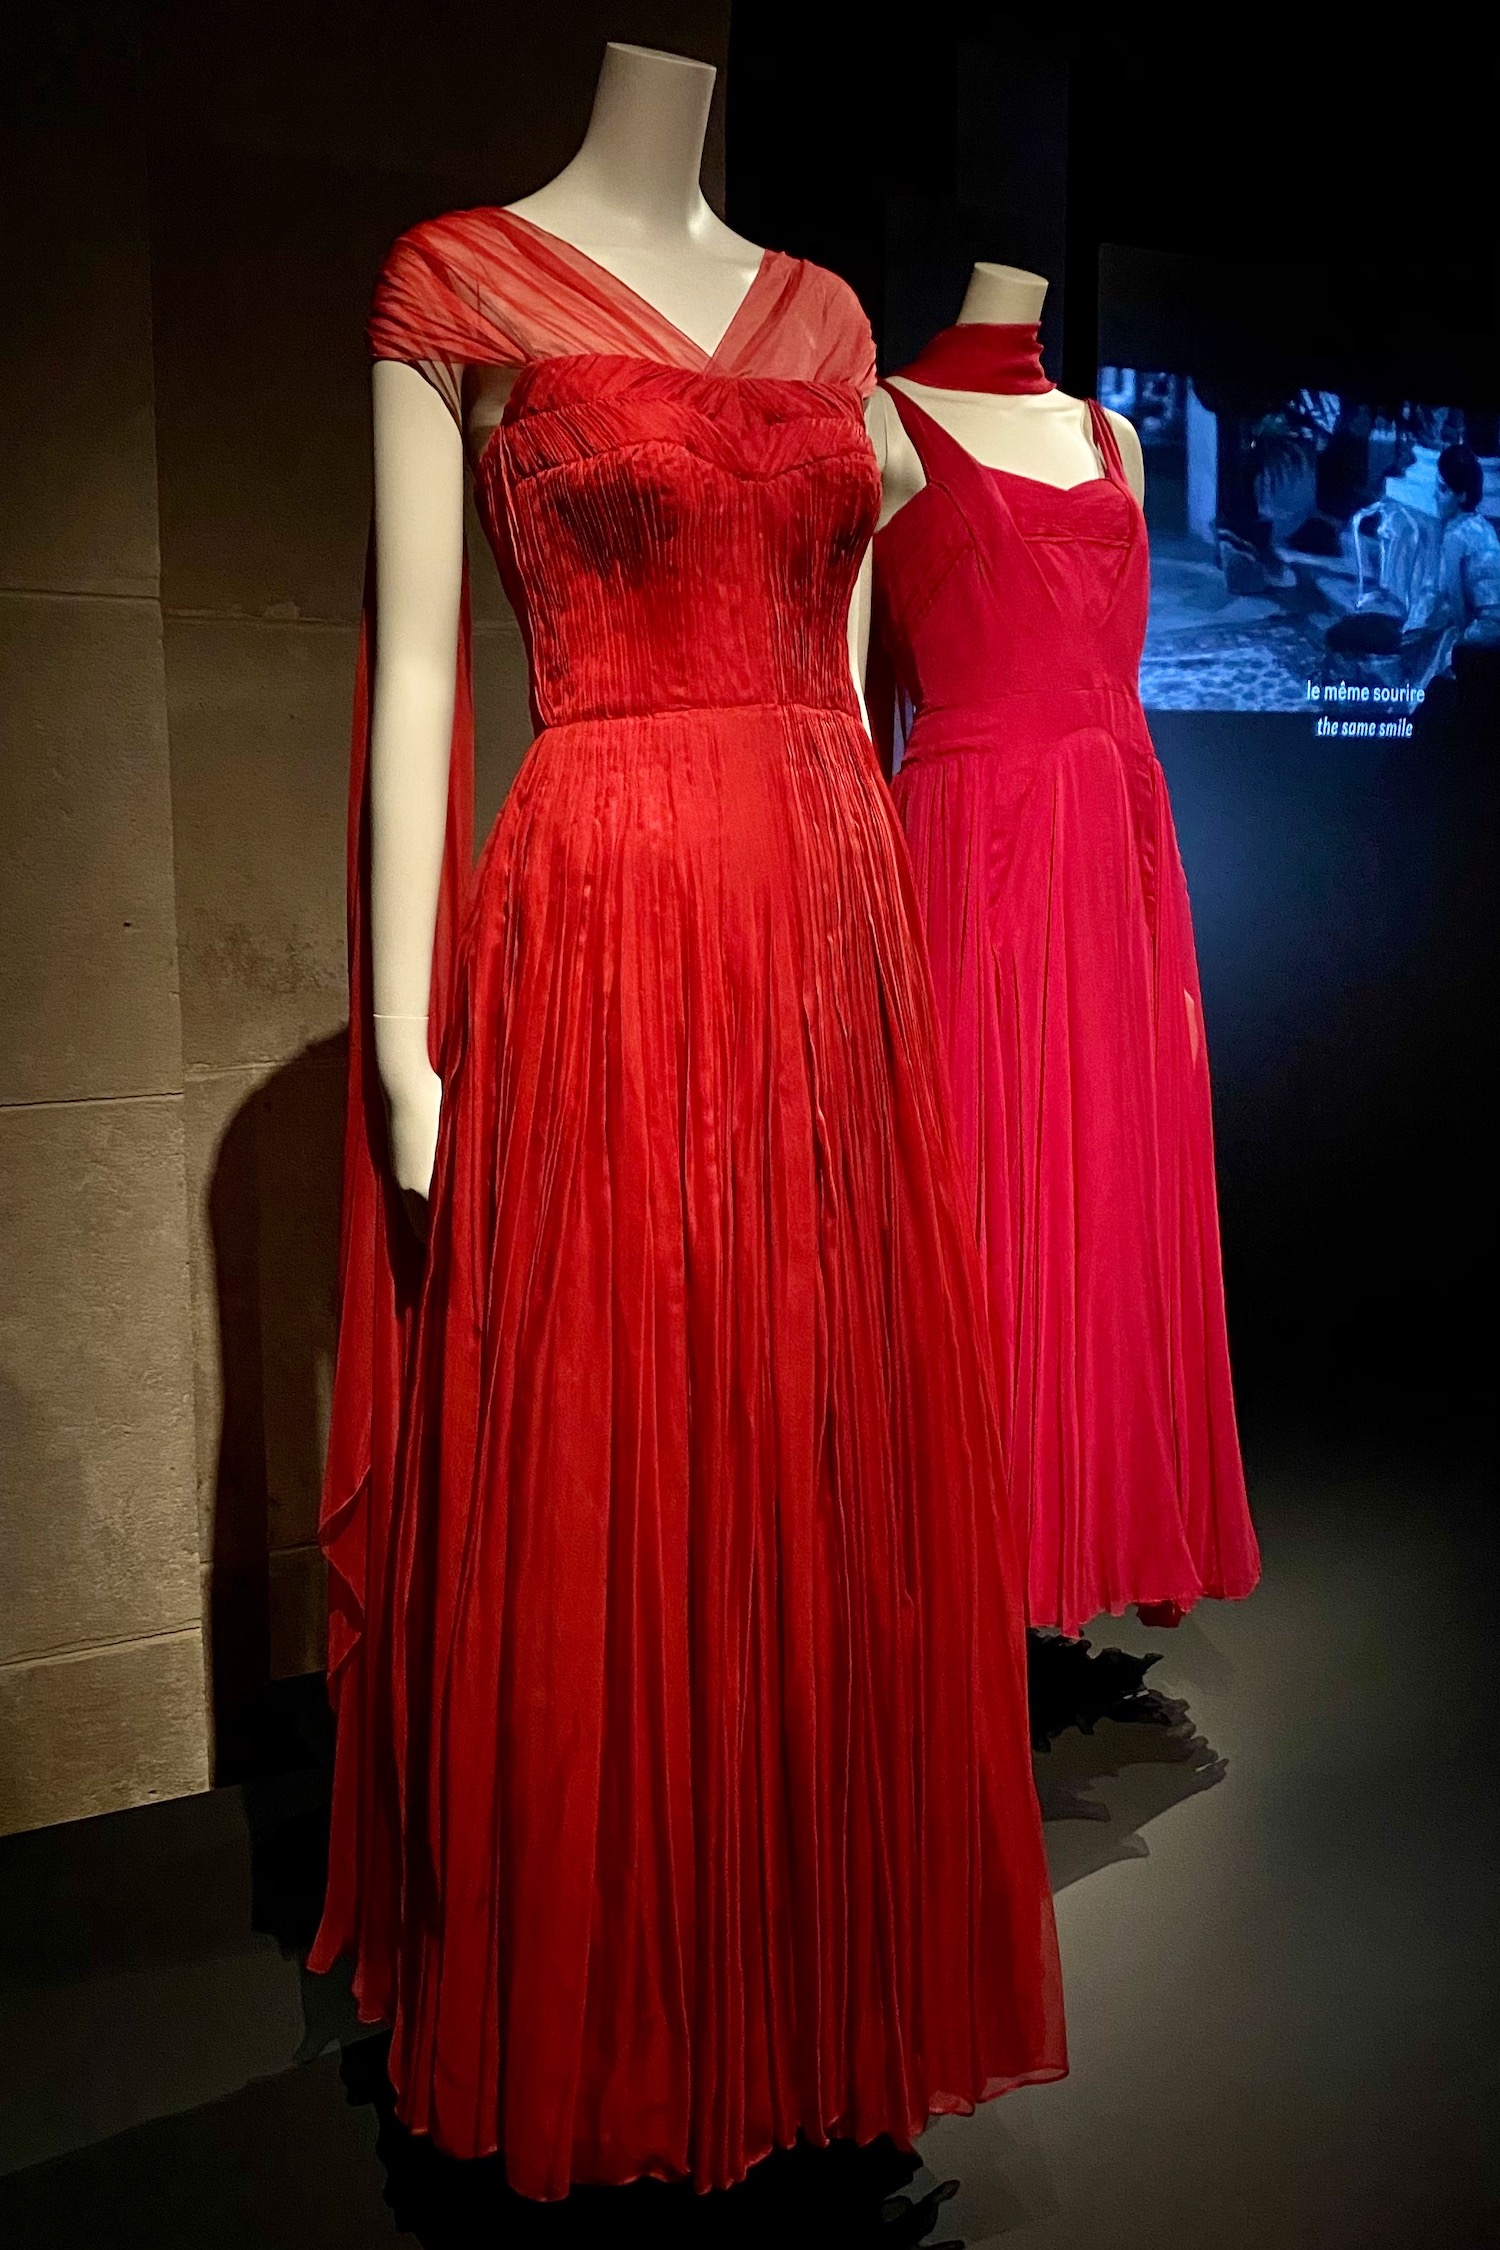 red dresses Gabrielle Chanel Fashion Manifesto exhibit